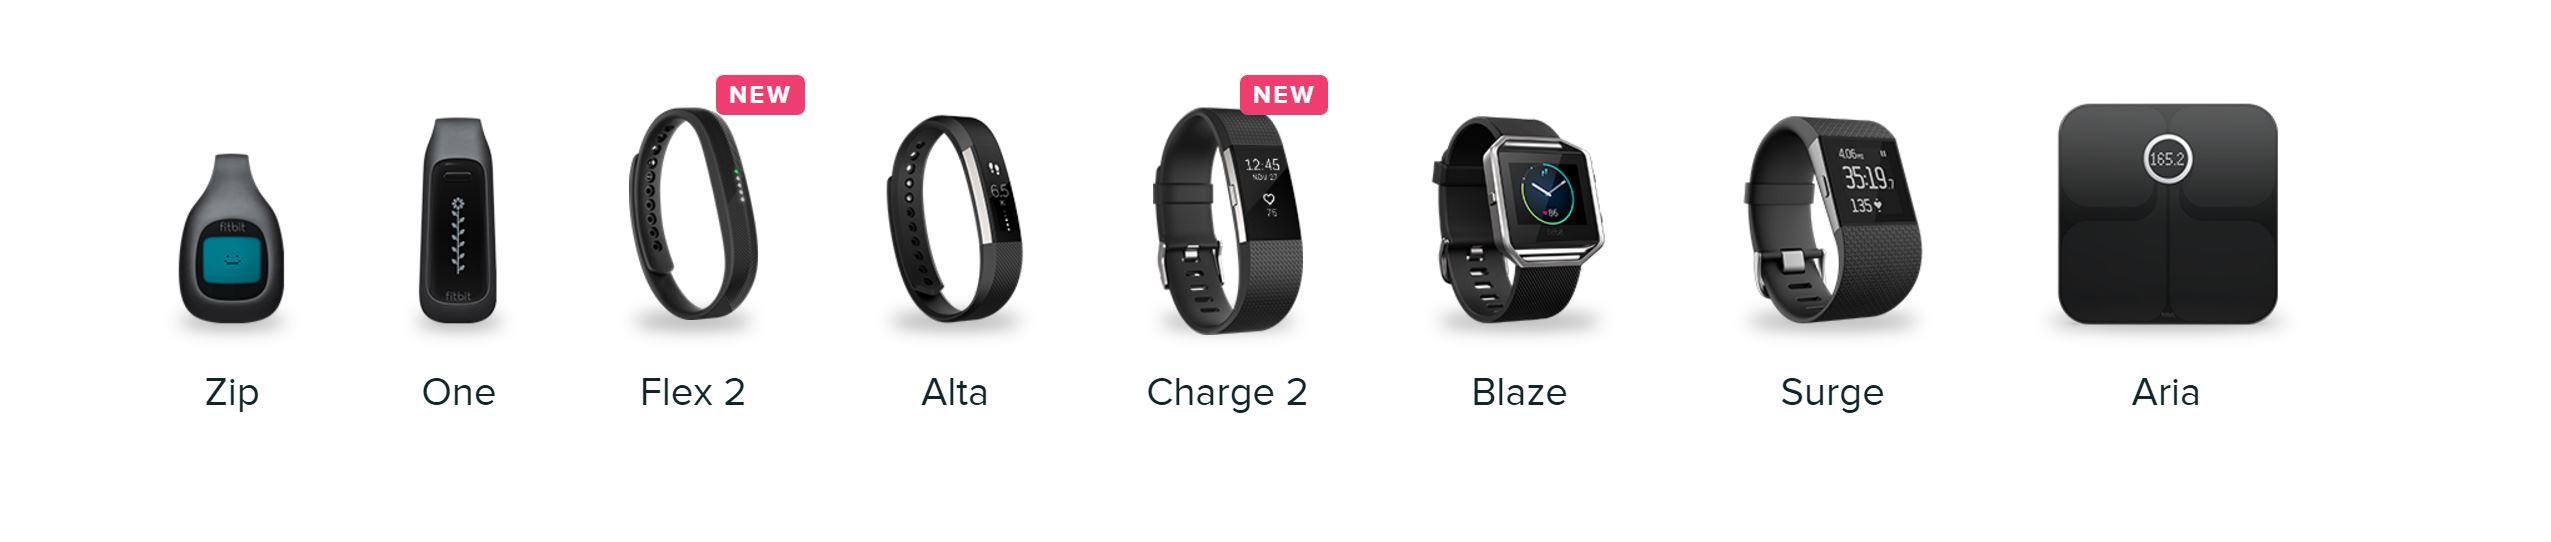 fitbit ceasuri inteligente ceas inteligent bratara fitness